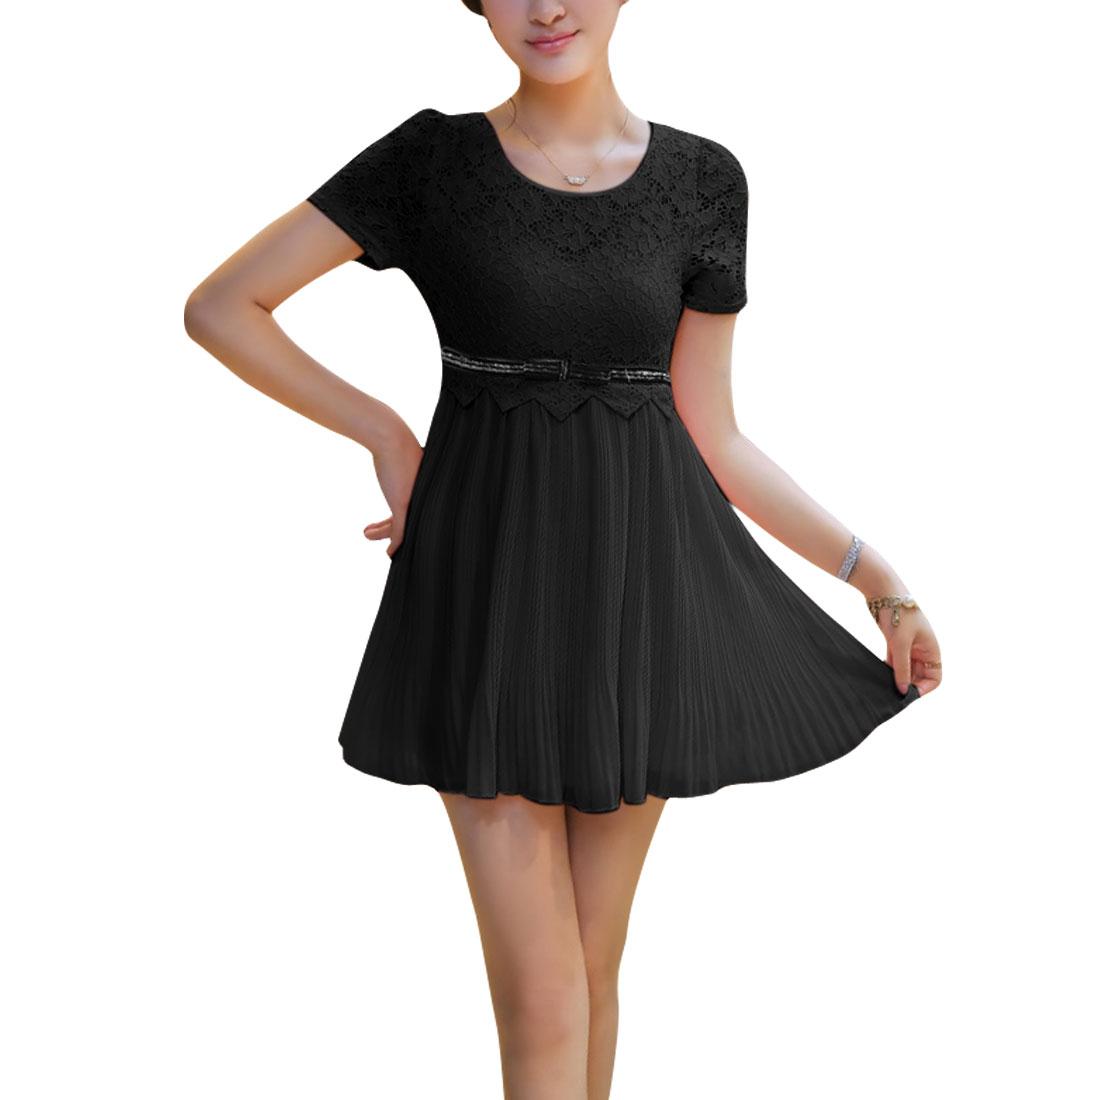 Ladies Hidden Zipper Side Above Knee Spliced Lace Dress Black S